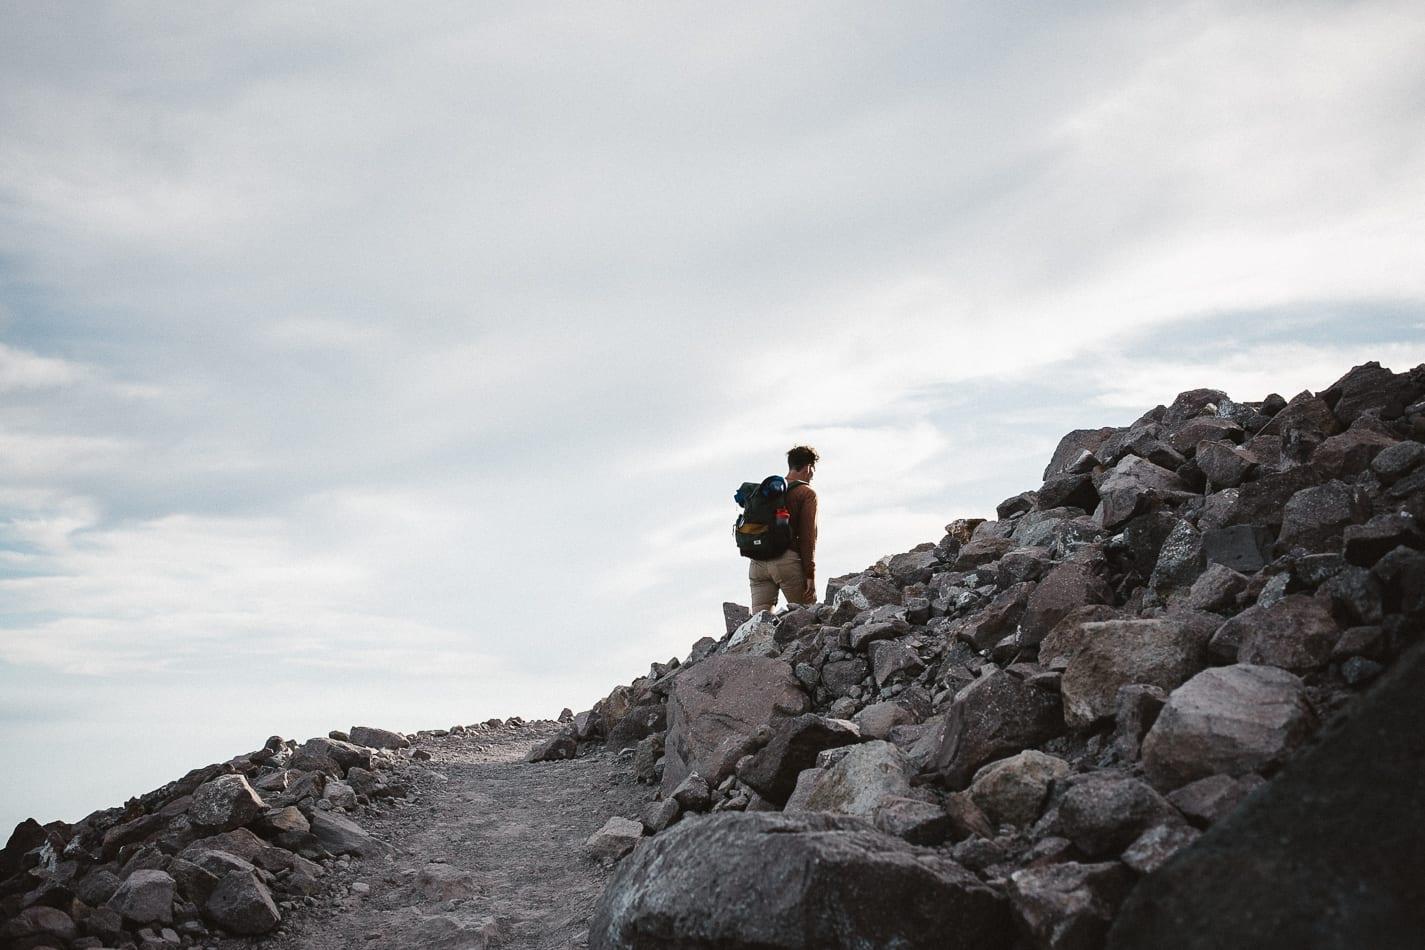 mount-lassen-california-adventure-lifestyle-photorapher-28